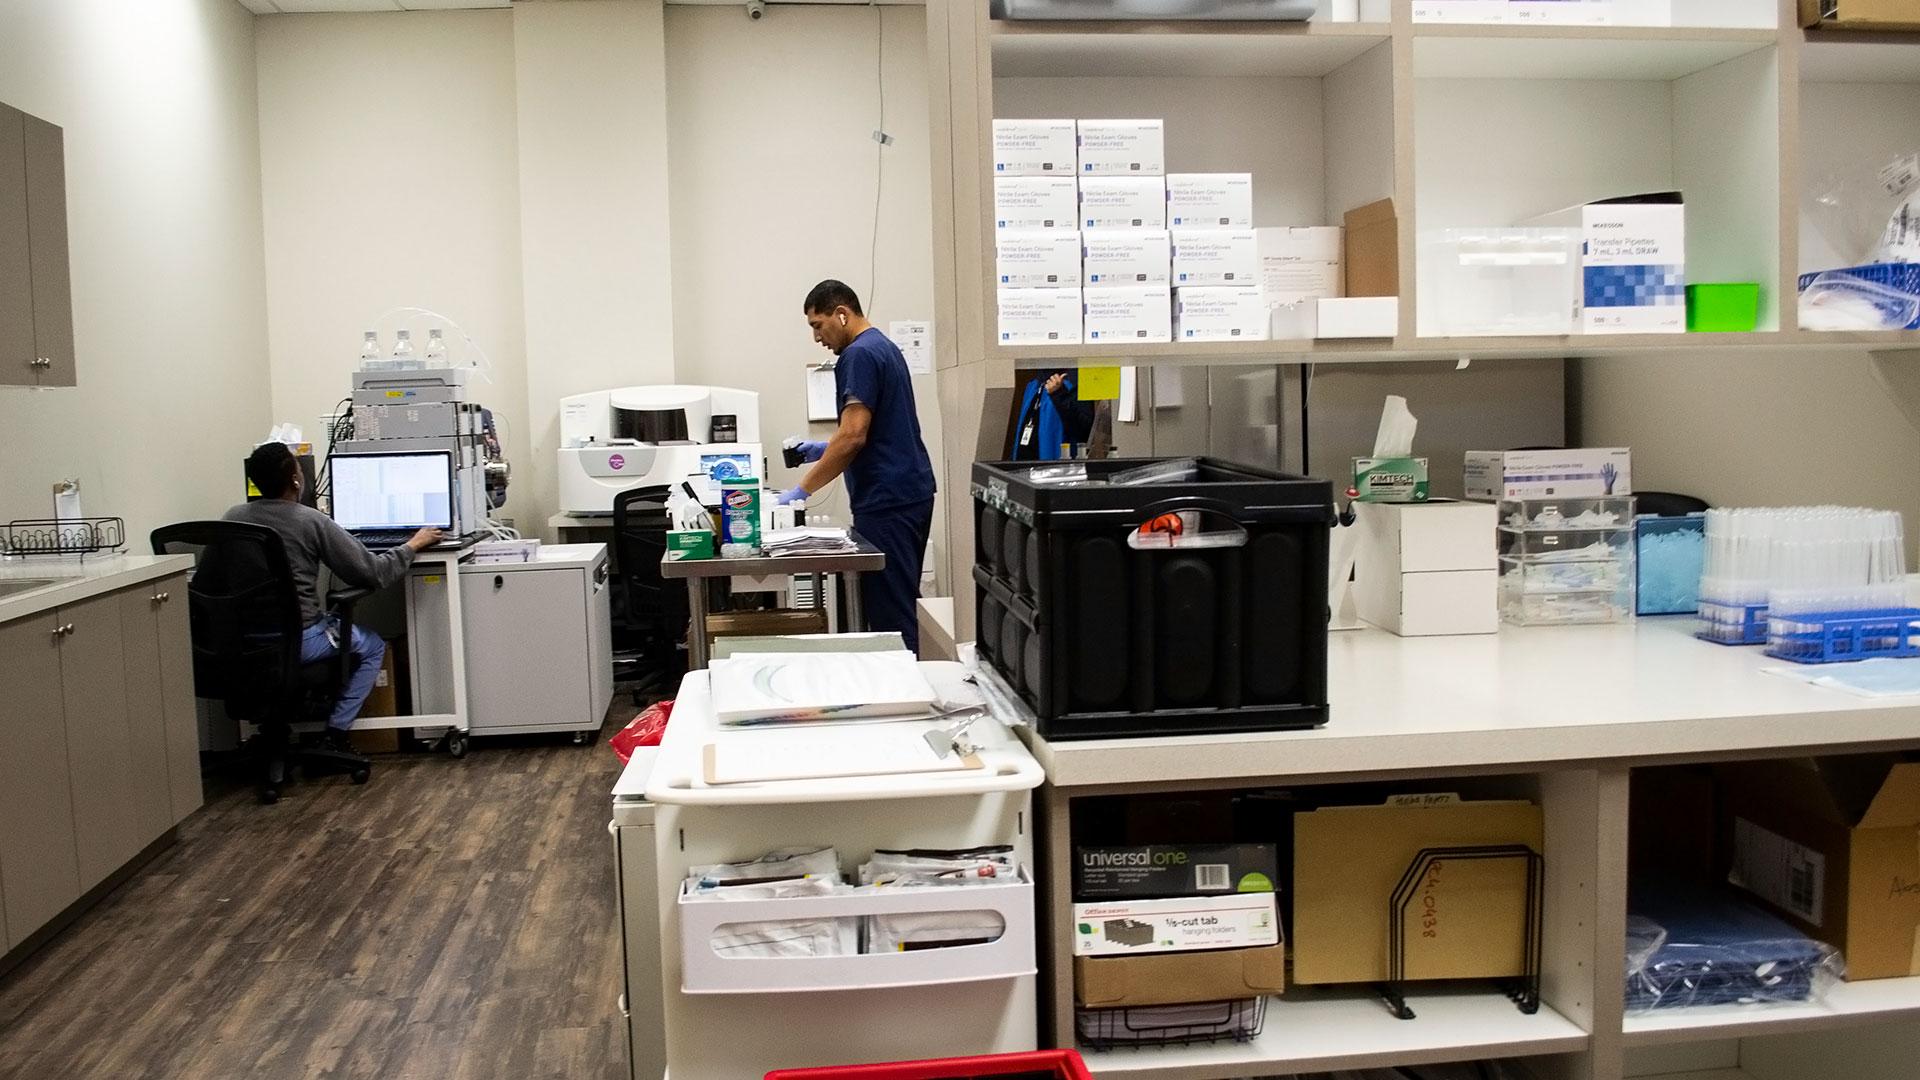 lab 5 - Our Lab